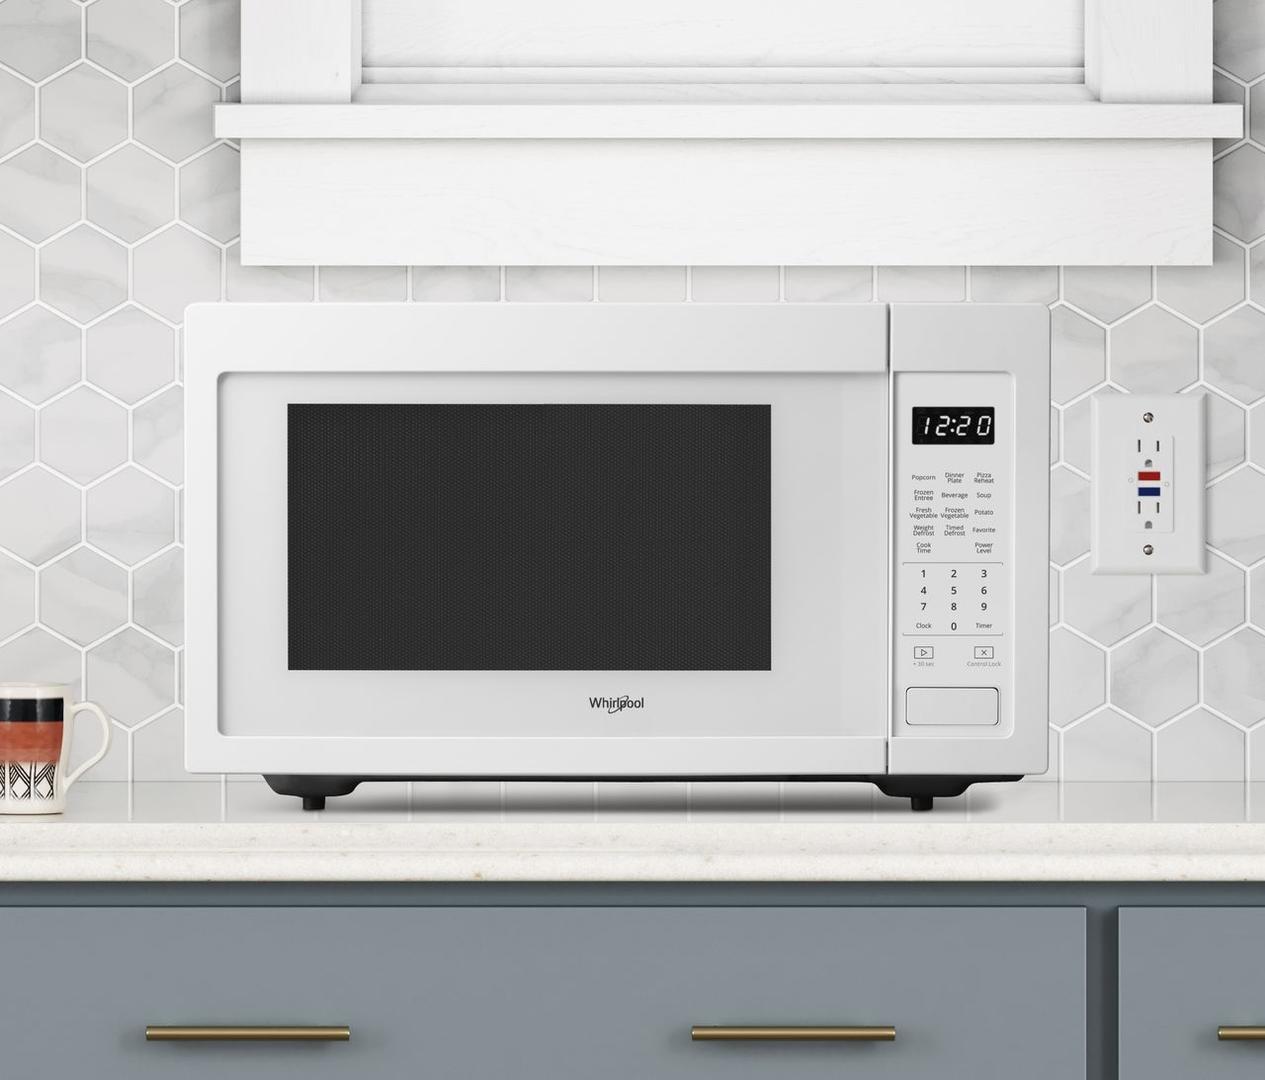 Wmc30516h Whirlpool Wmc30516h Countertop Microwaves